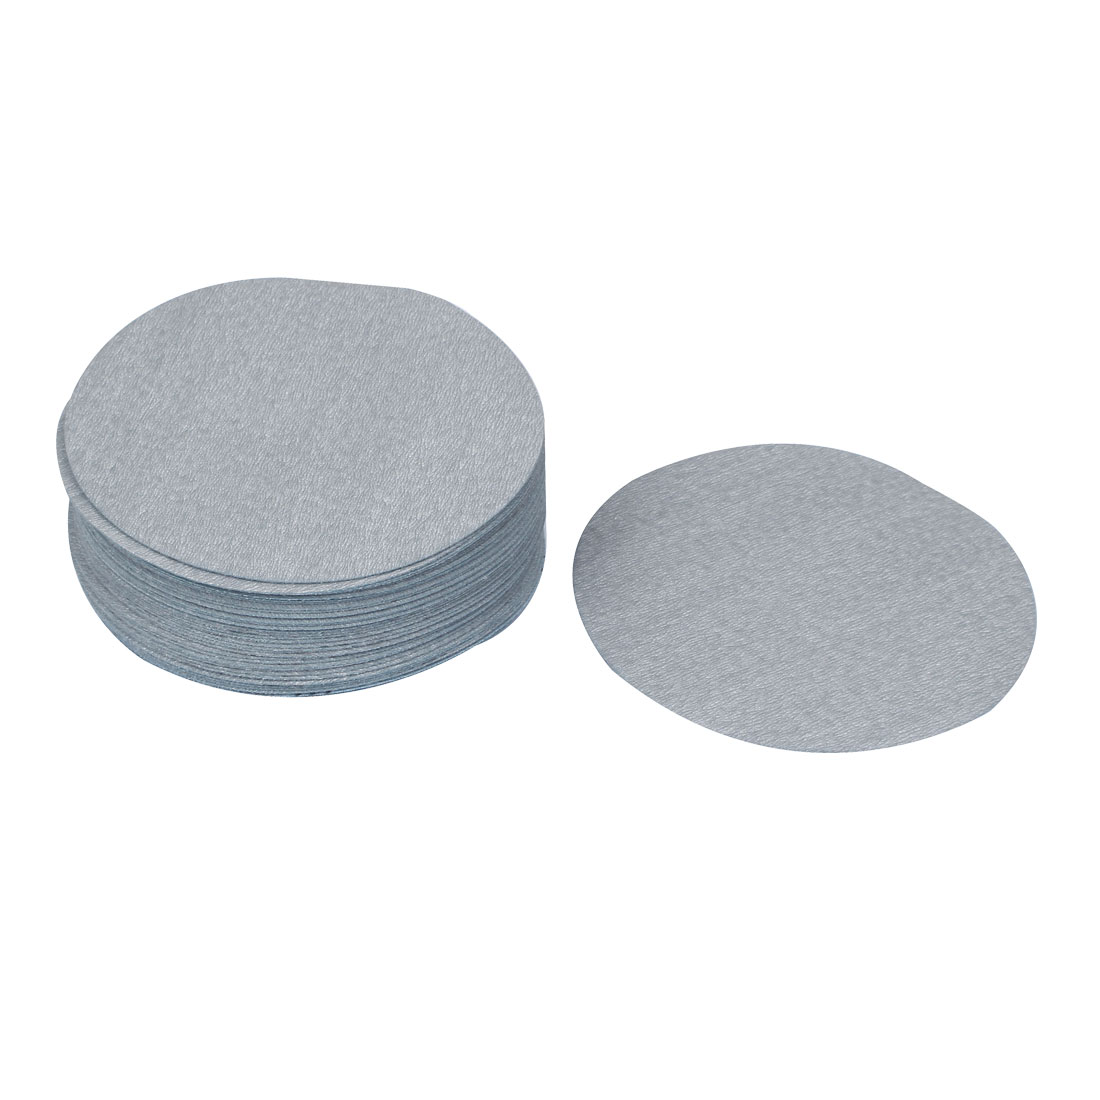 "6"" Dia Polishing Round Dry Abrasive Sanding Sandpaper Sheet Disc 1000 Grit 50pcs"